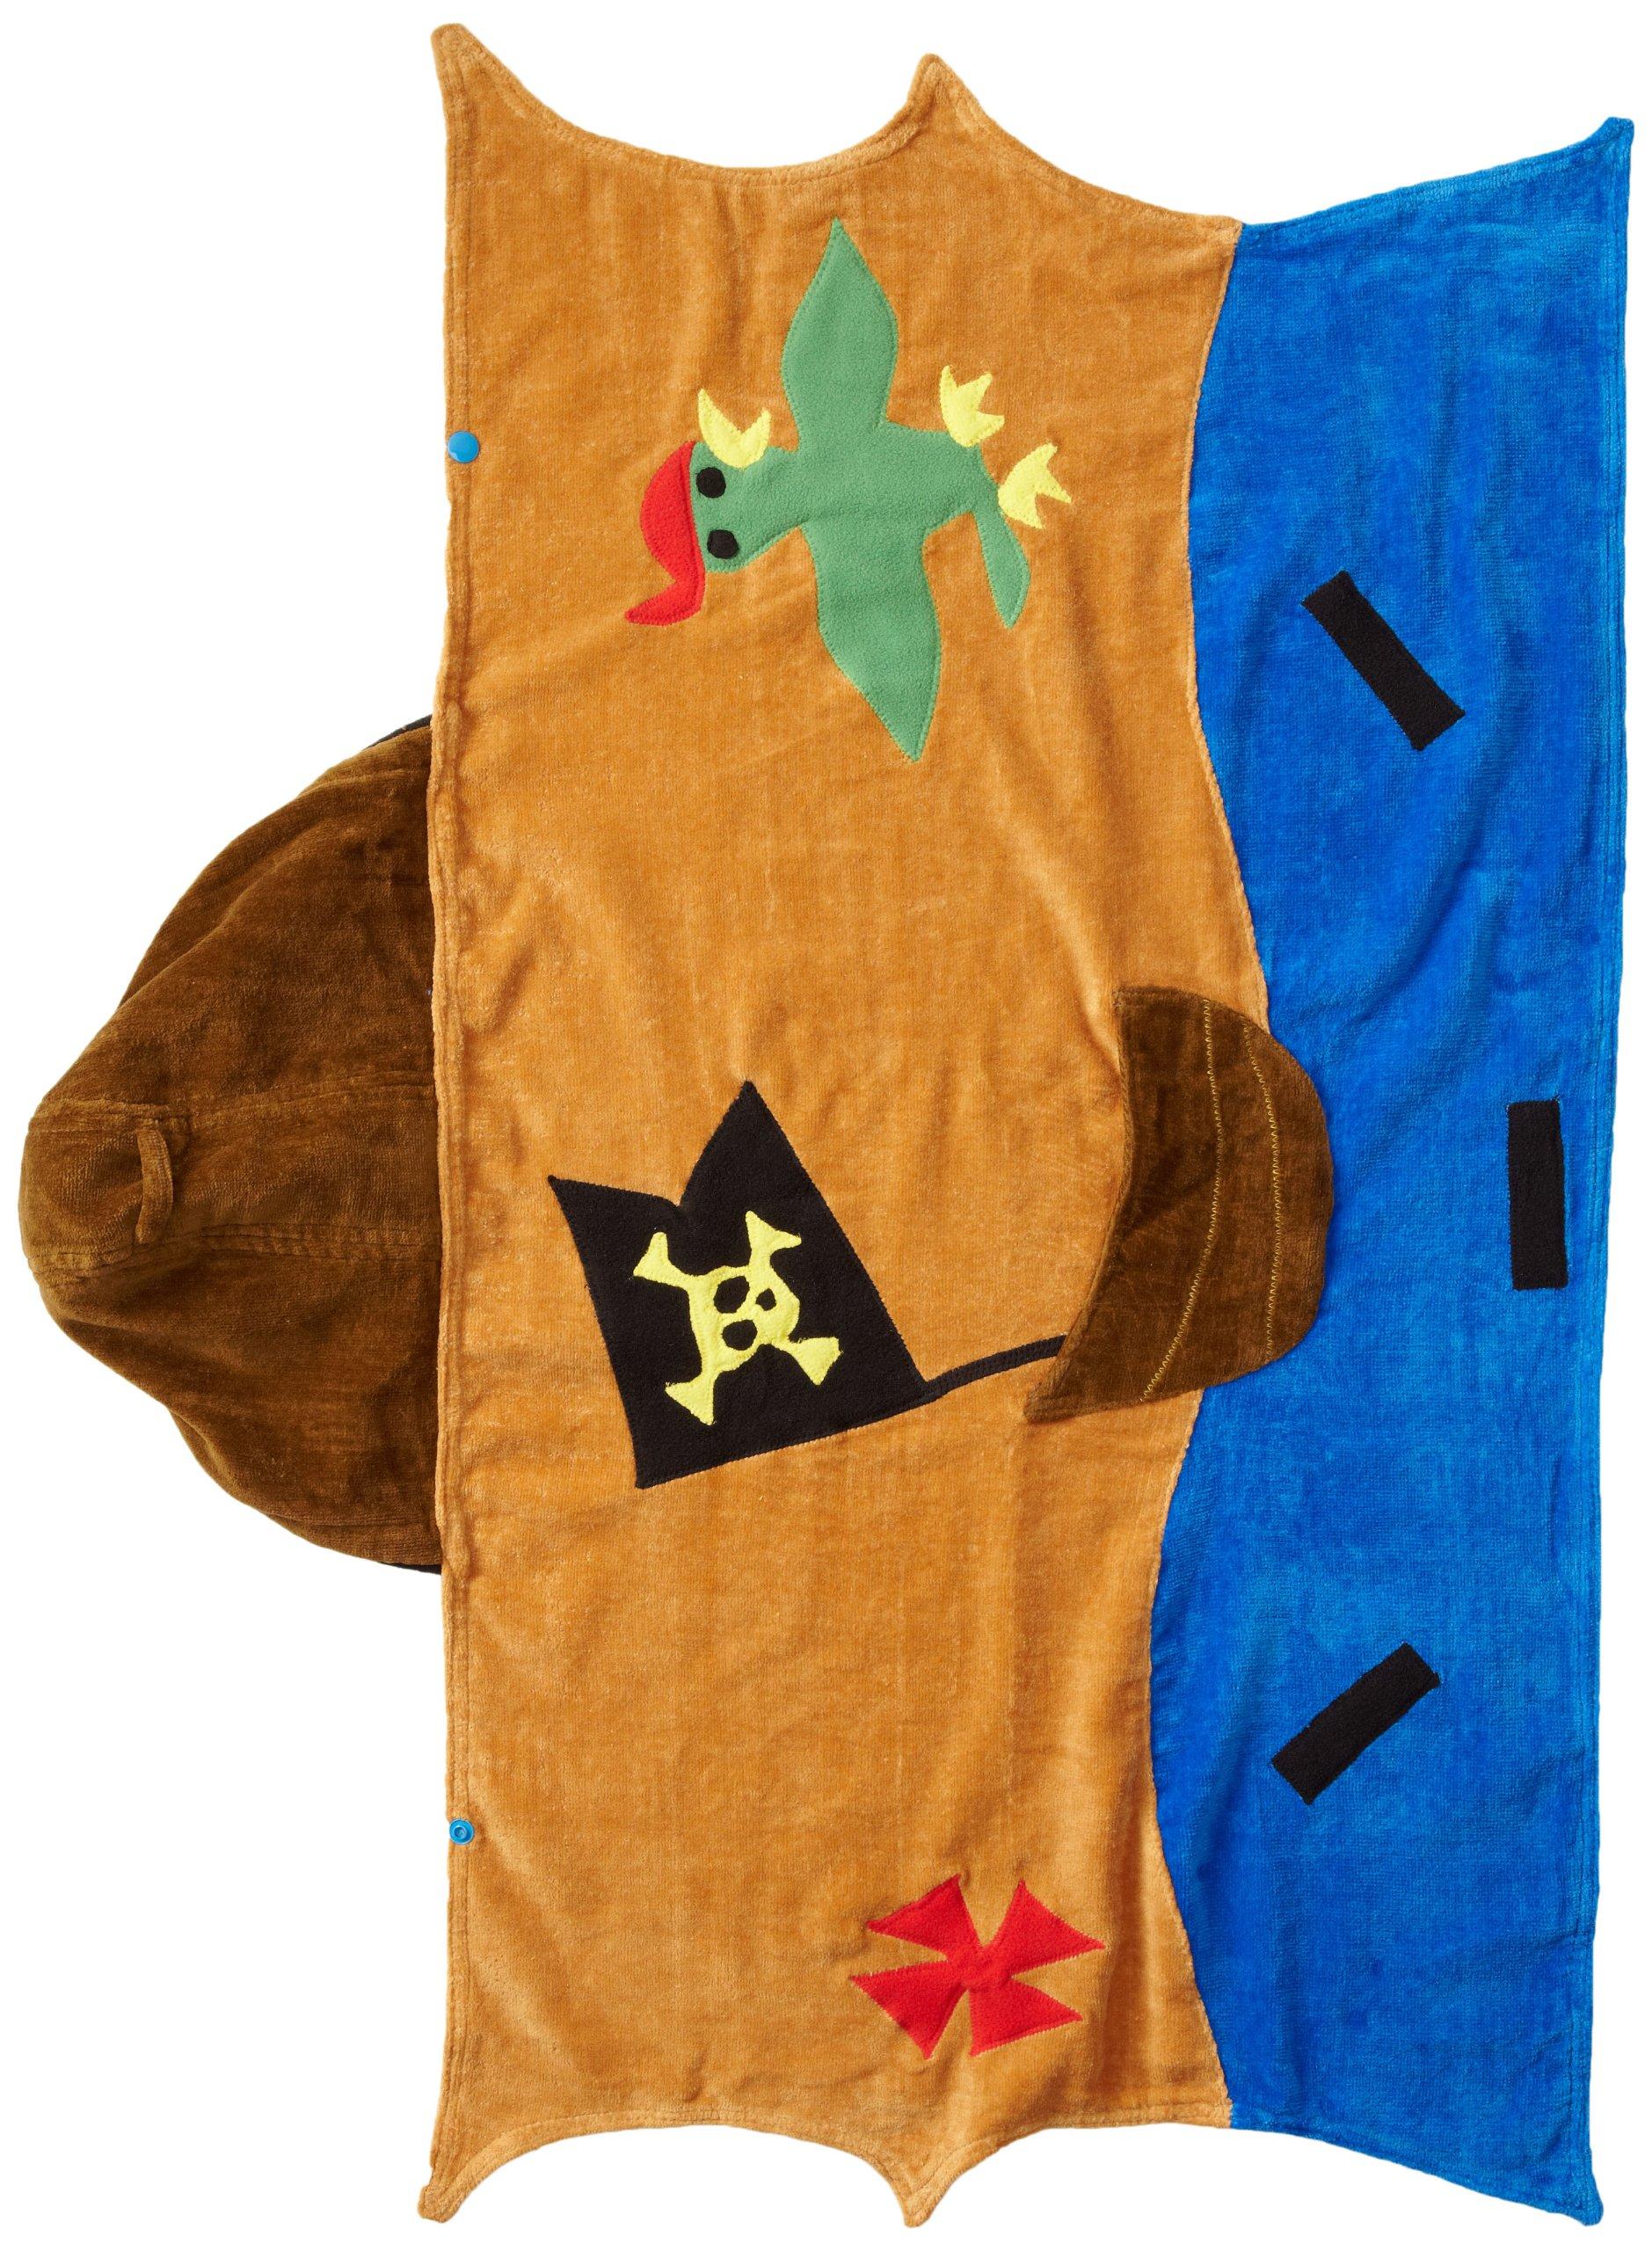 Kidorable Pirate Toddler Towel, Brown, Medium, 3-6 Years by Kidorable (Image #2)